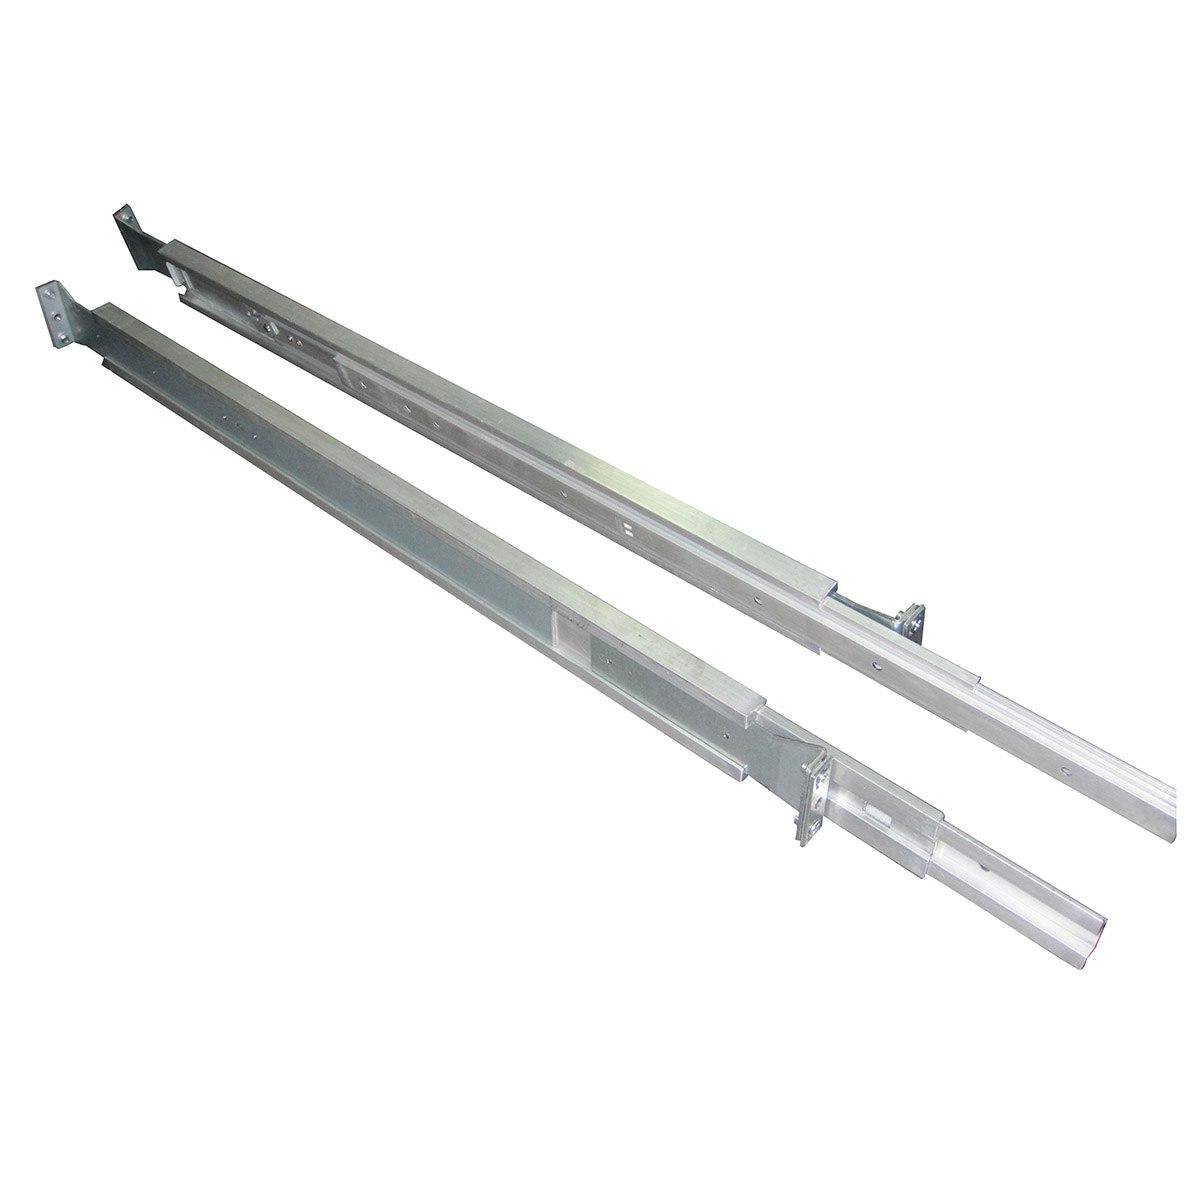 TGC Rack Mountable Server Case Metal Slide Rails 600MM For TGC 1U Chassis